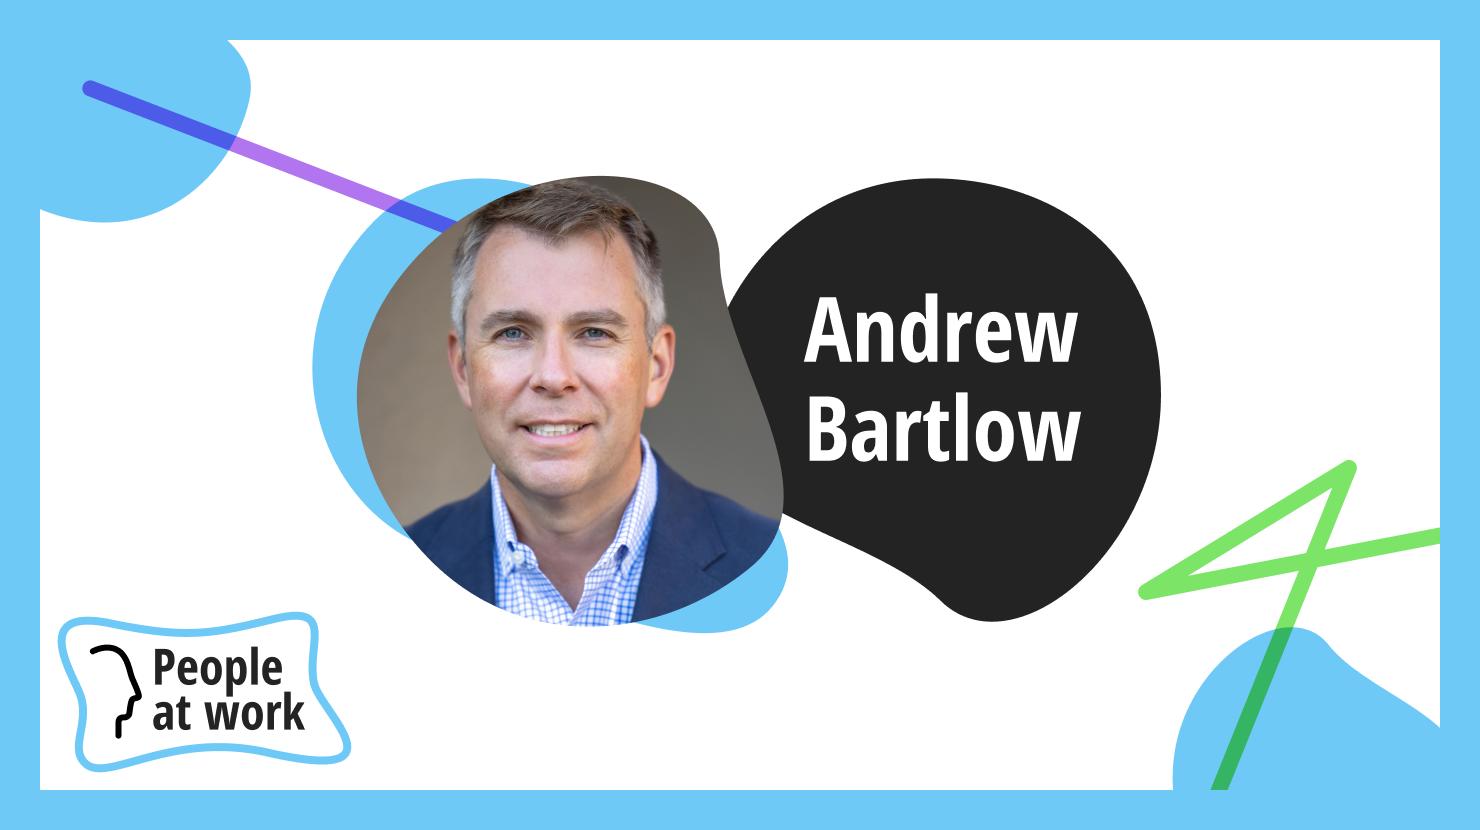 Best practices aren't always what's best with Andrew Bartlow